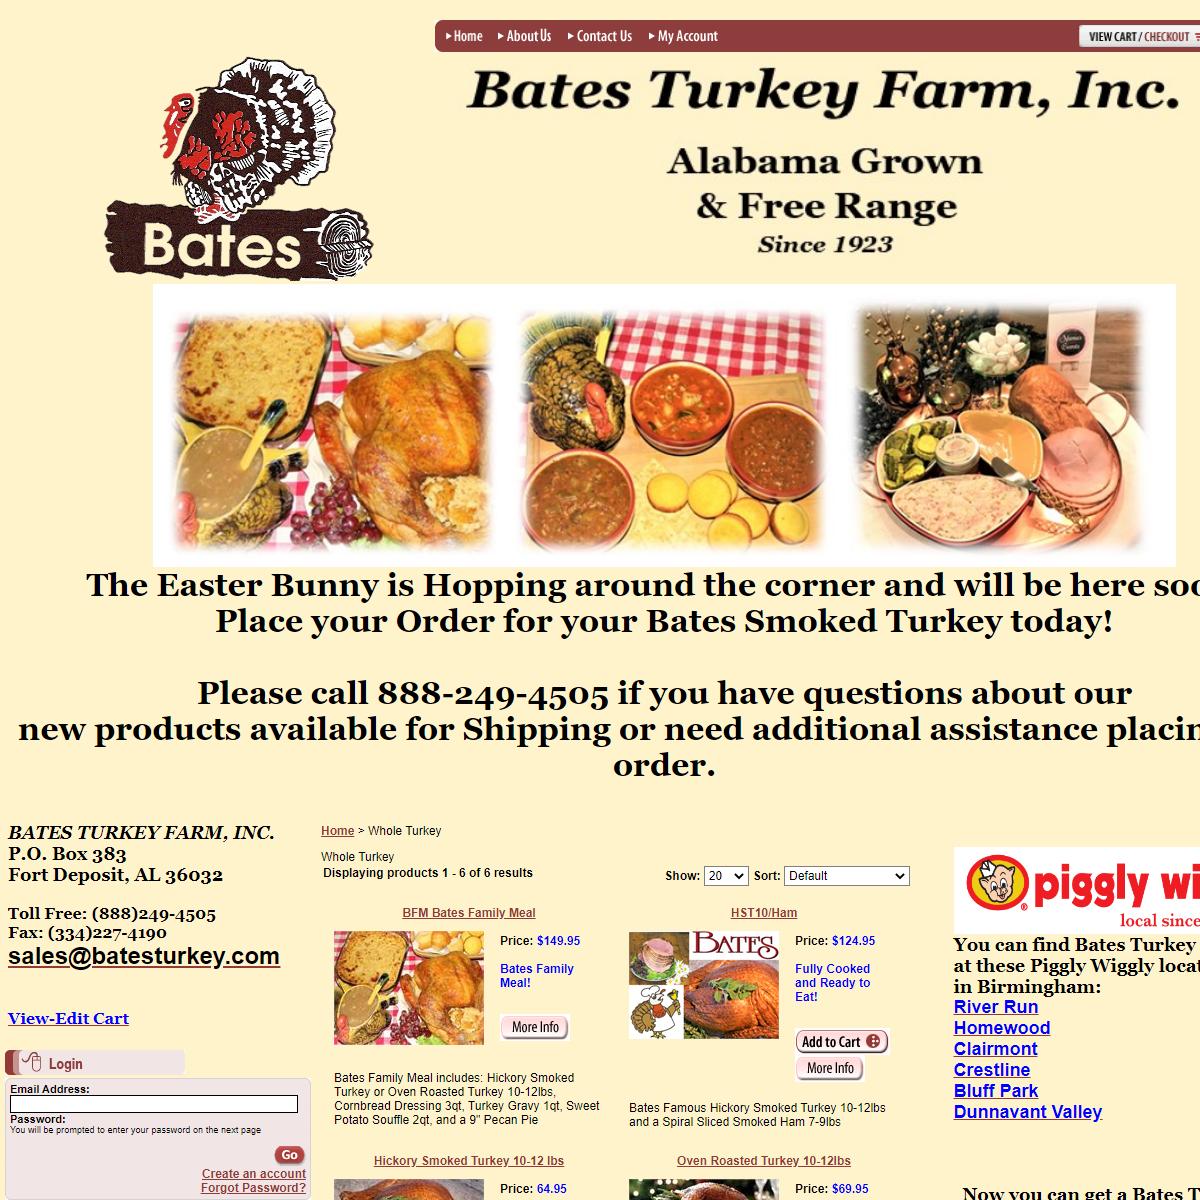 BATES TURKEY FARM, INC